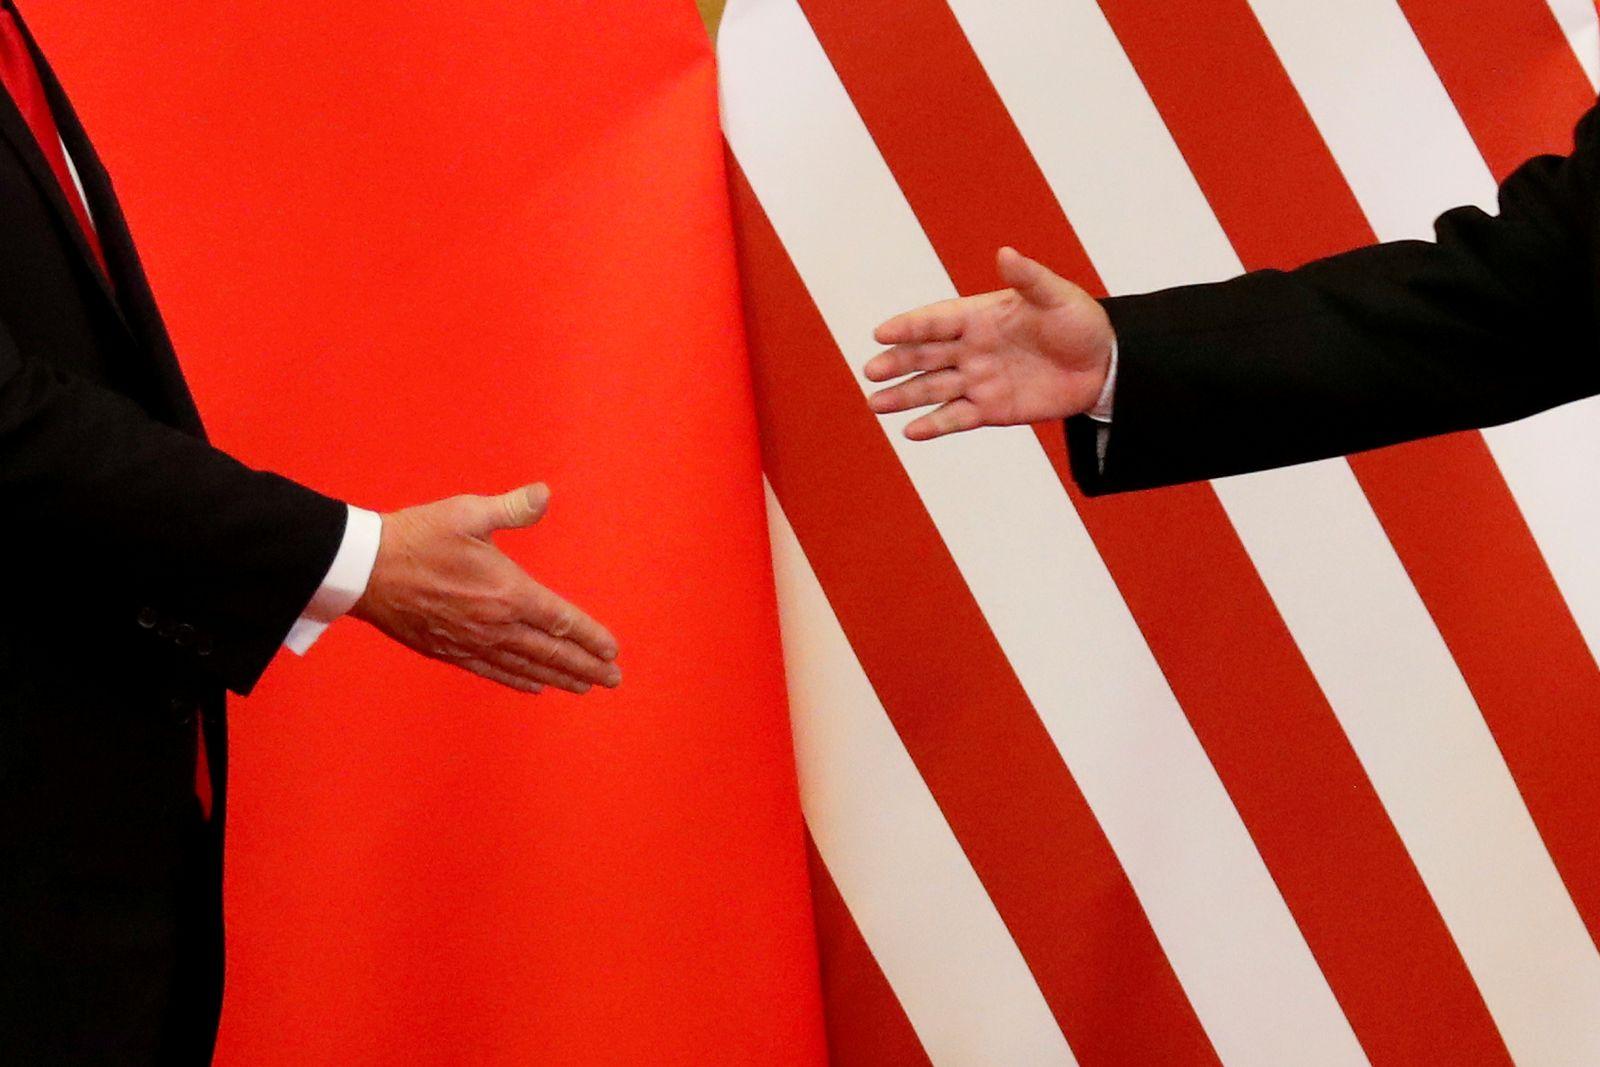 USA-TRADE/CHINA-REPORT